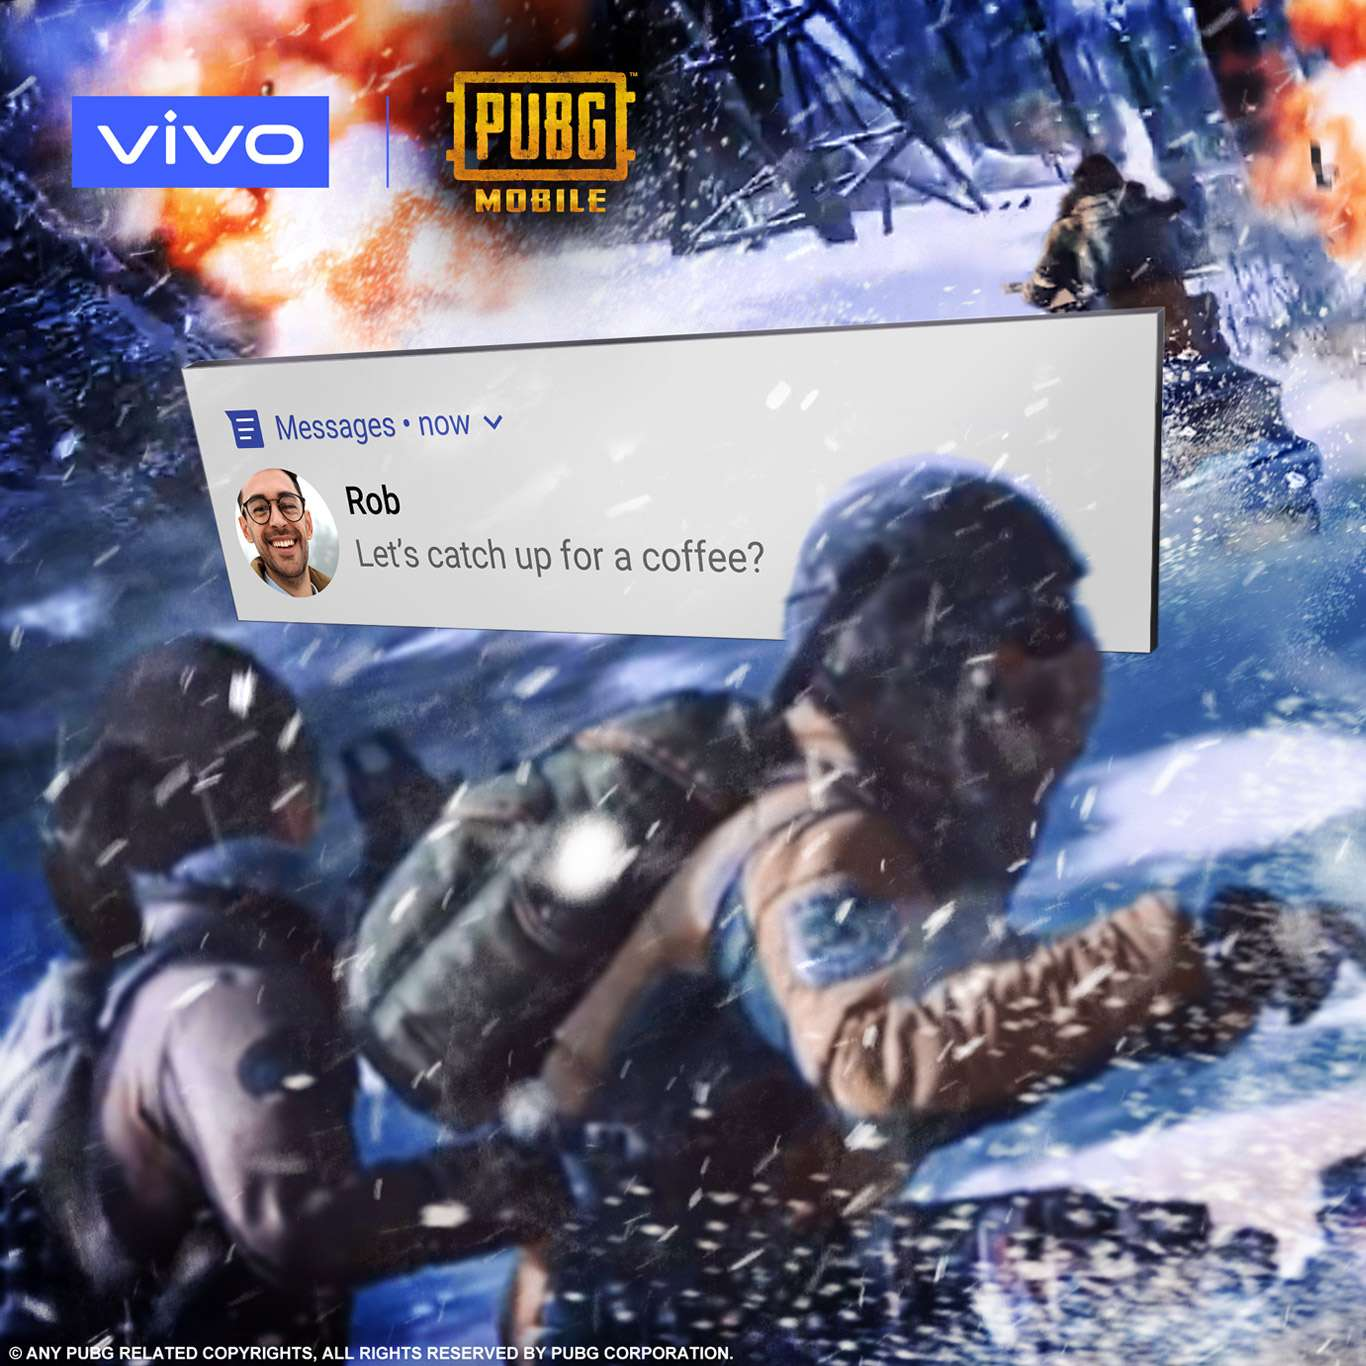 Vivo_SocialPost_PUBG_SnowMobile_essencial